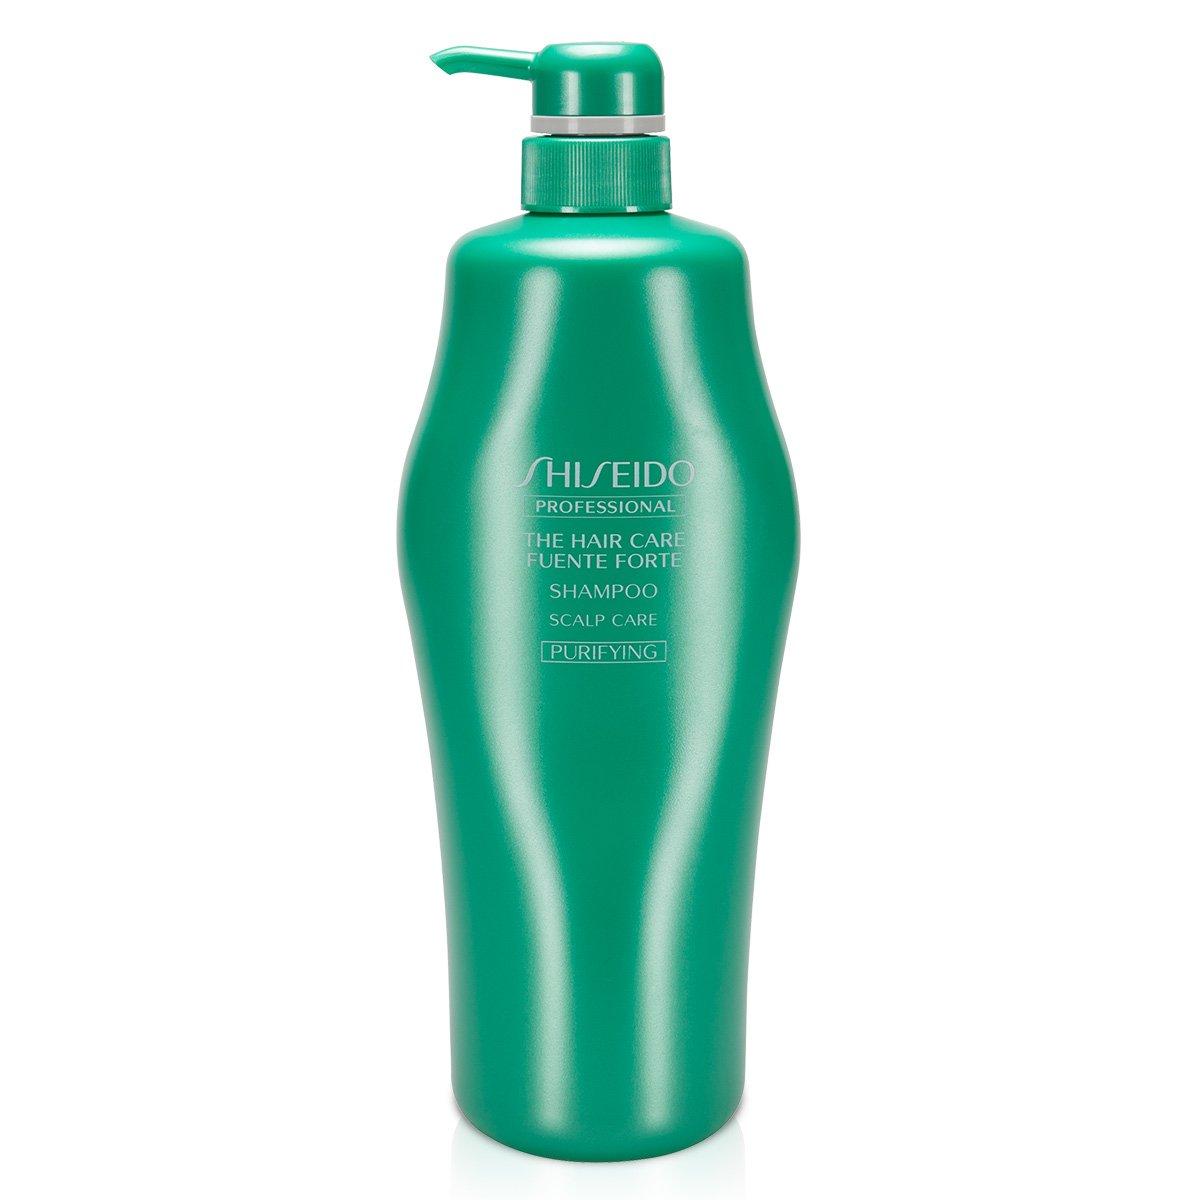 Shiseido The Hair Care Fuente Forte Purifying Shampoo, 33.8 Ounce